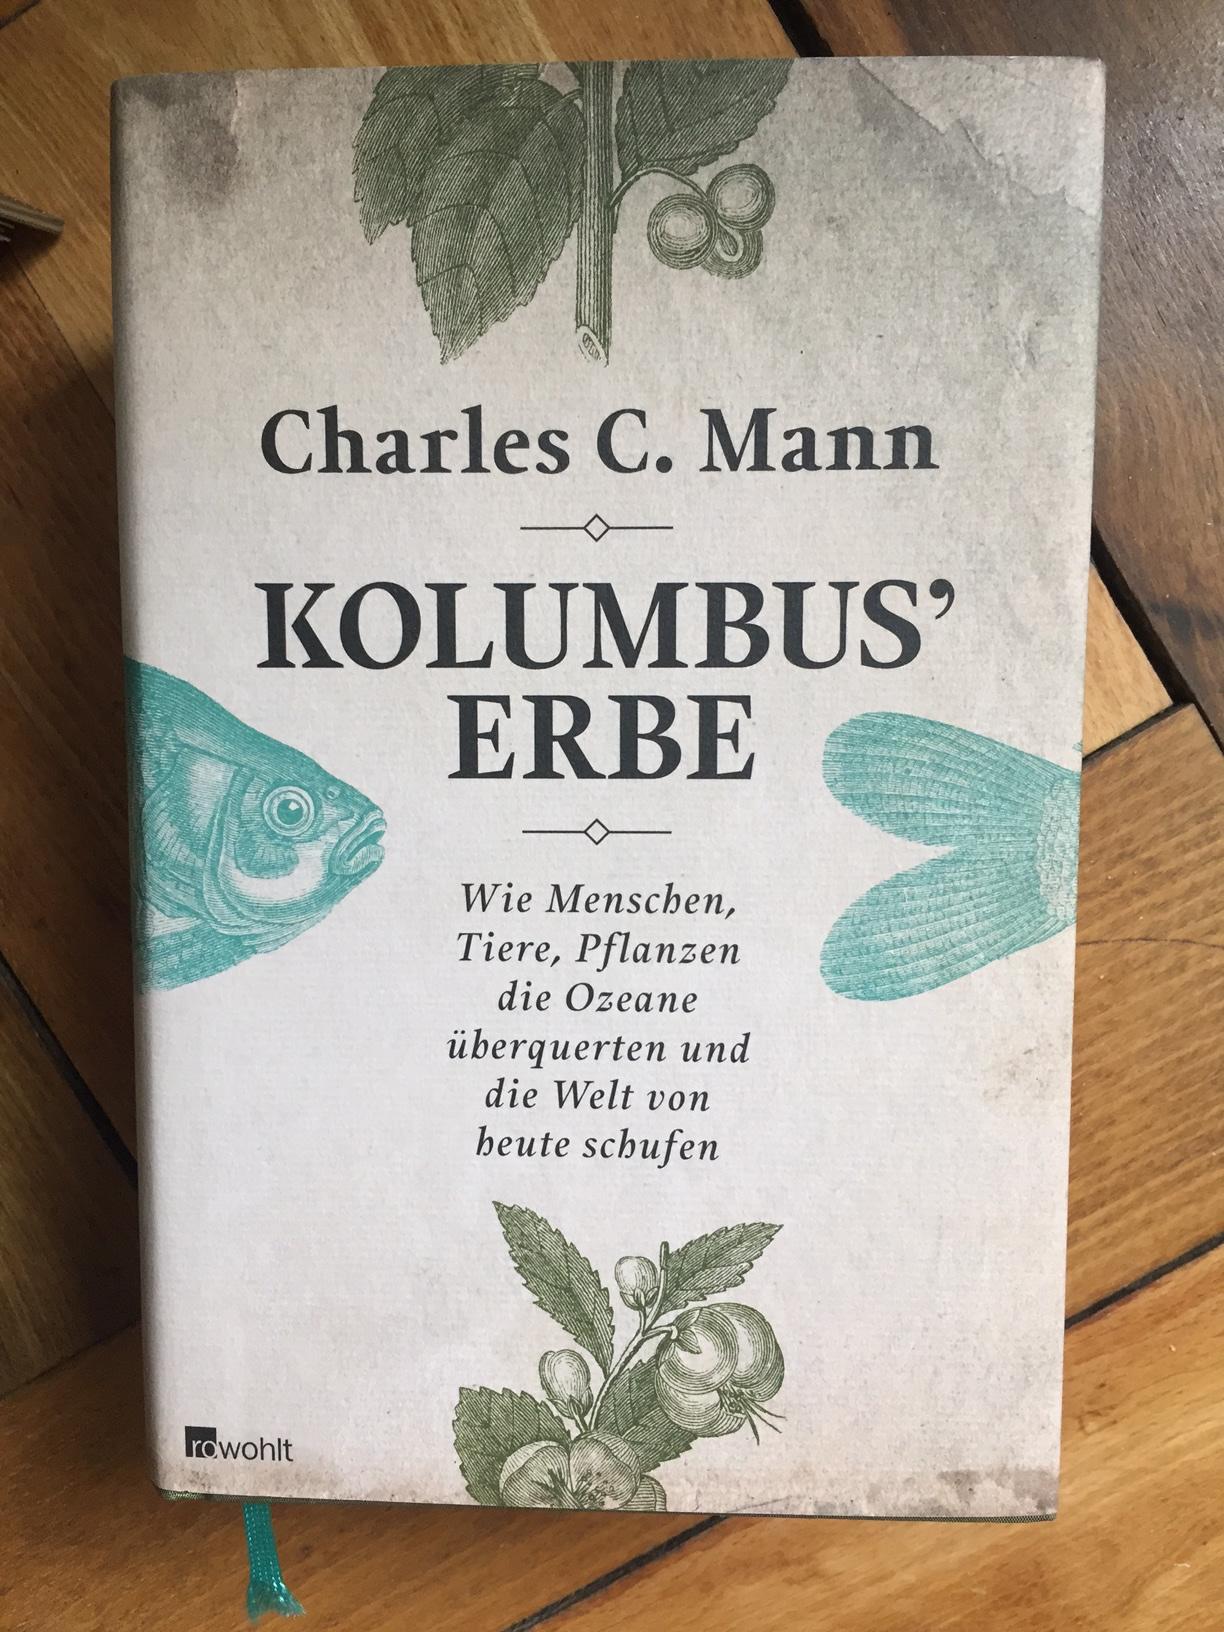 Charles C Mann Kolumbus' Erbe - Buch Review